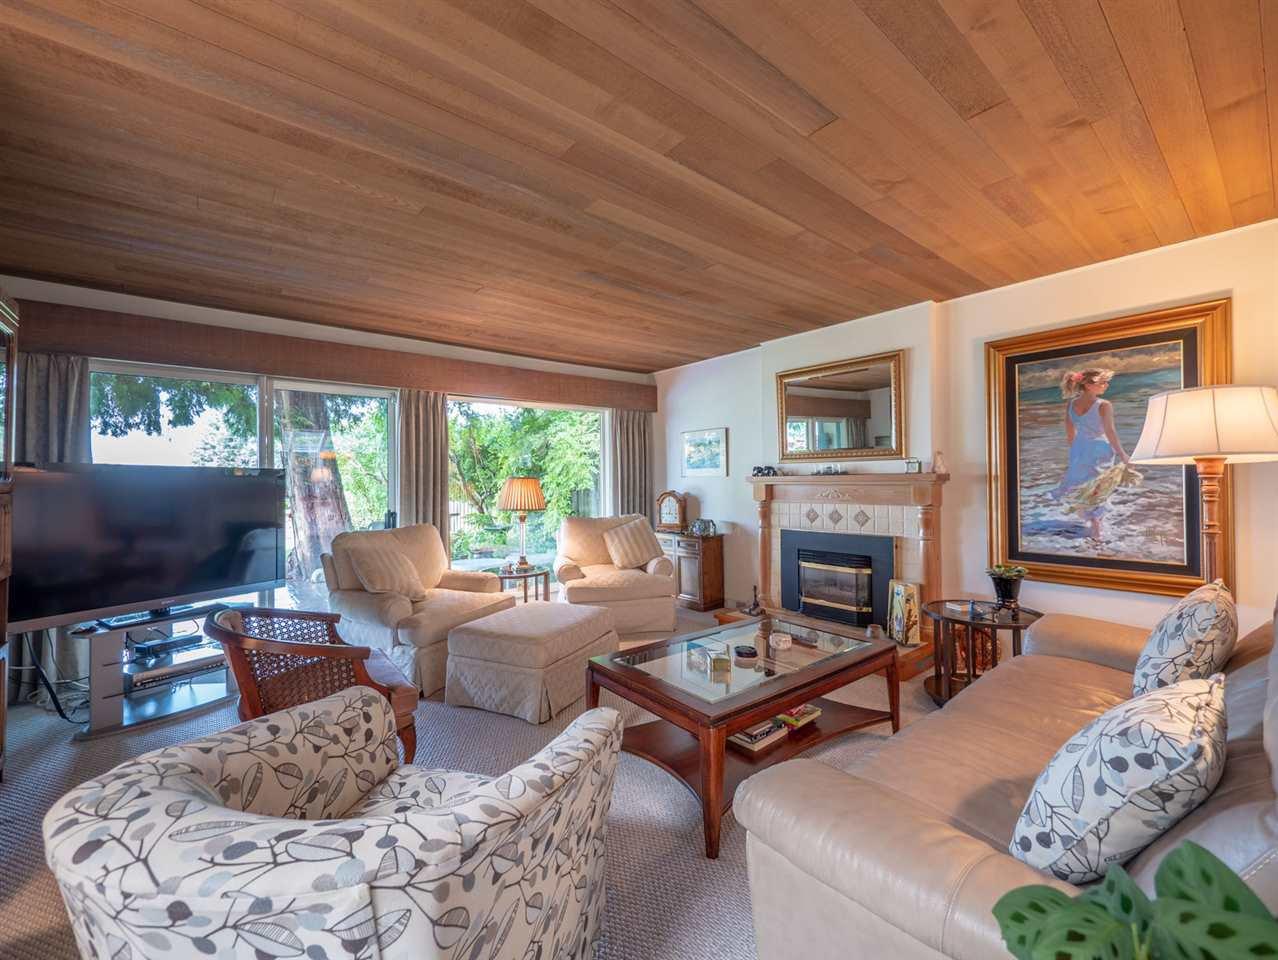 Main Photo: 5254 YACHT Road in Sechelt: Sechelt District House for sale (Sunshine Coast)  : MLS®# R2306959